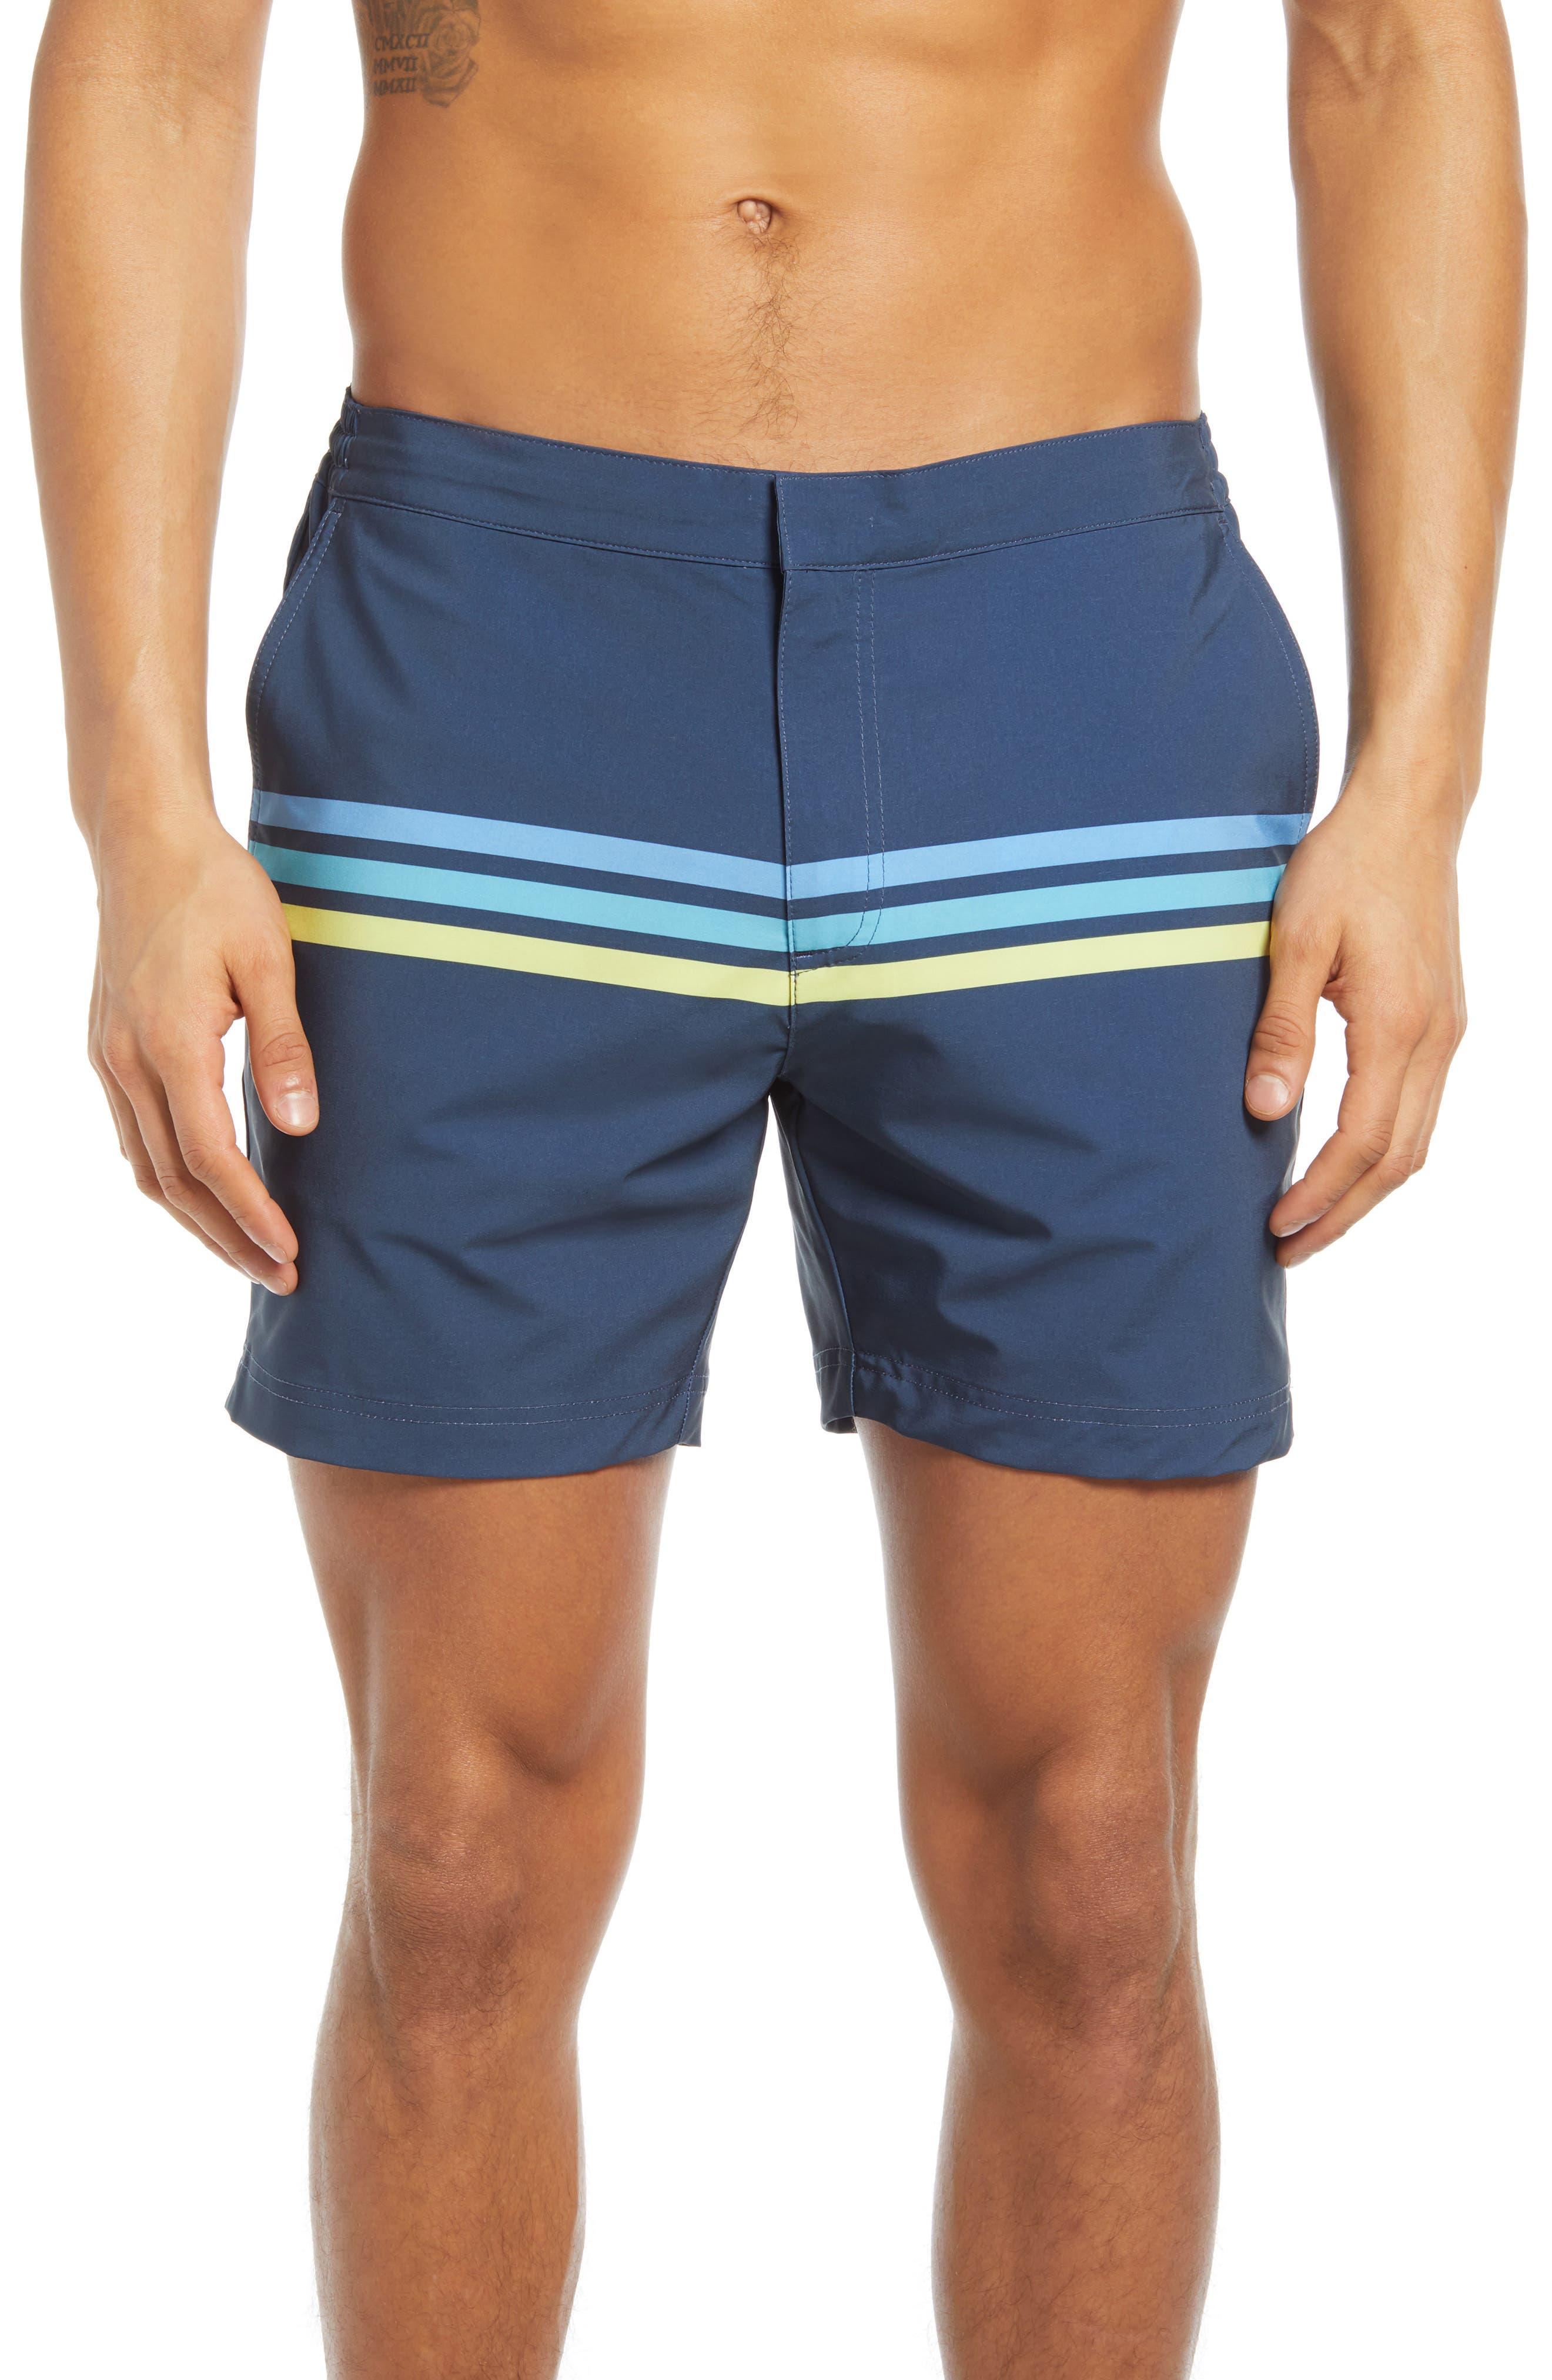 Vintage Men's Swimsuits – 1930s, 1940s, 1950s History Mens Fair Harbor The Sextant Stripe Swim Trunks Size 34 - Blue $88.00 AT vintagedancer.com